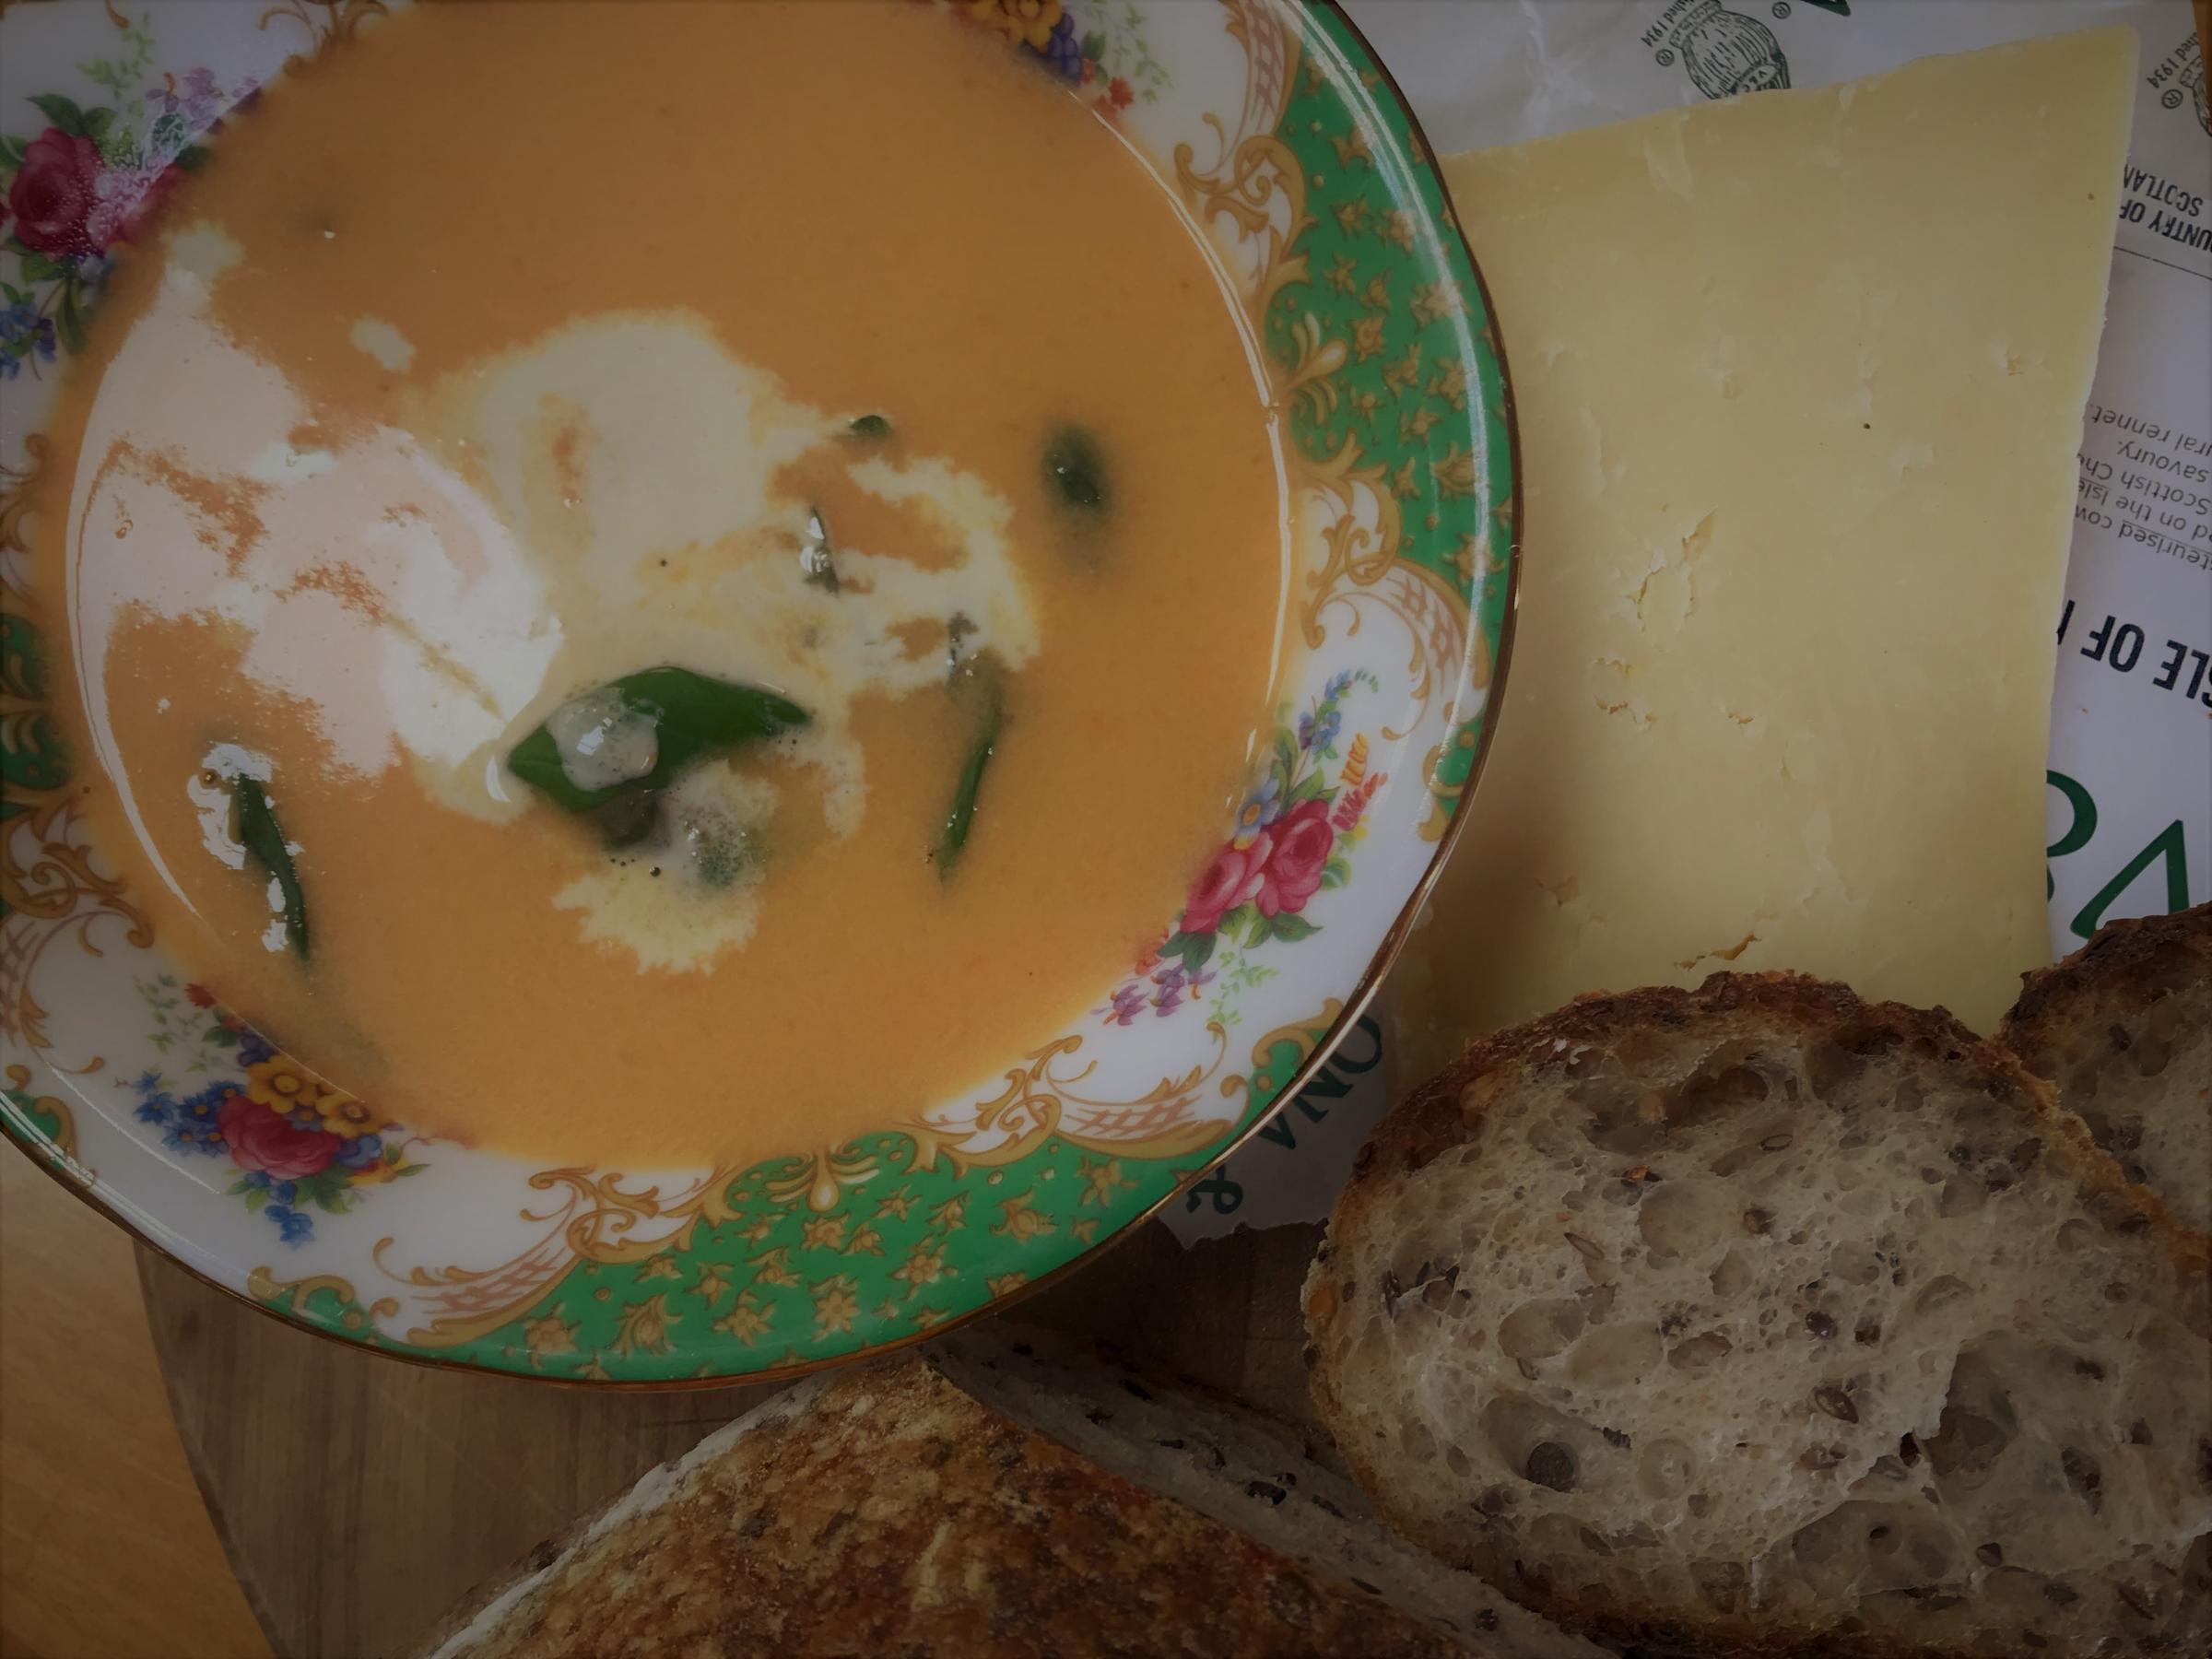 Resep Mary Contini: Manfaatkan tomat musim panas yang terakhir sebaik-baiknya